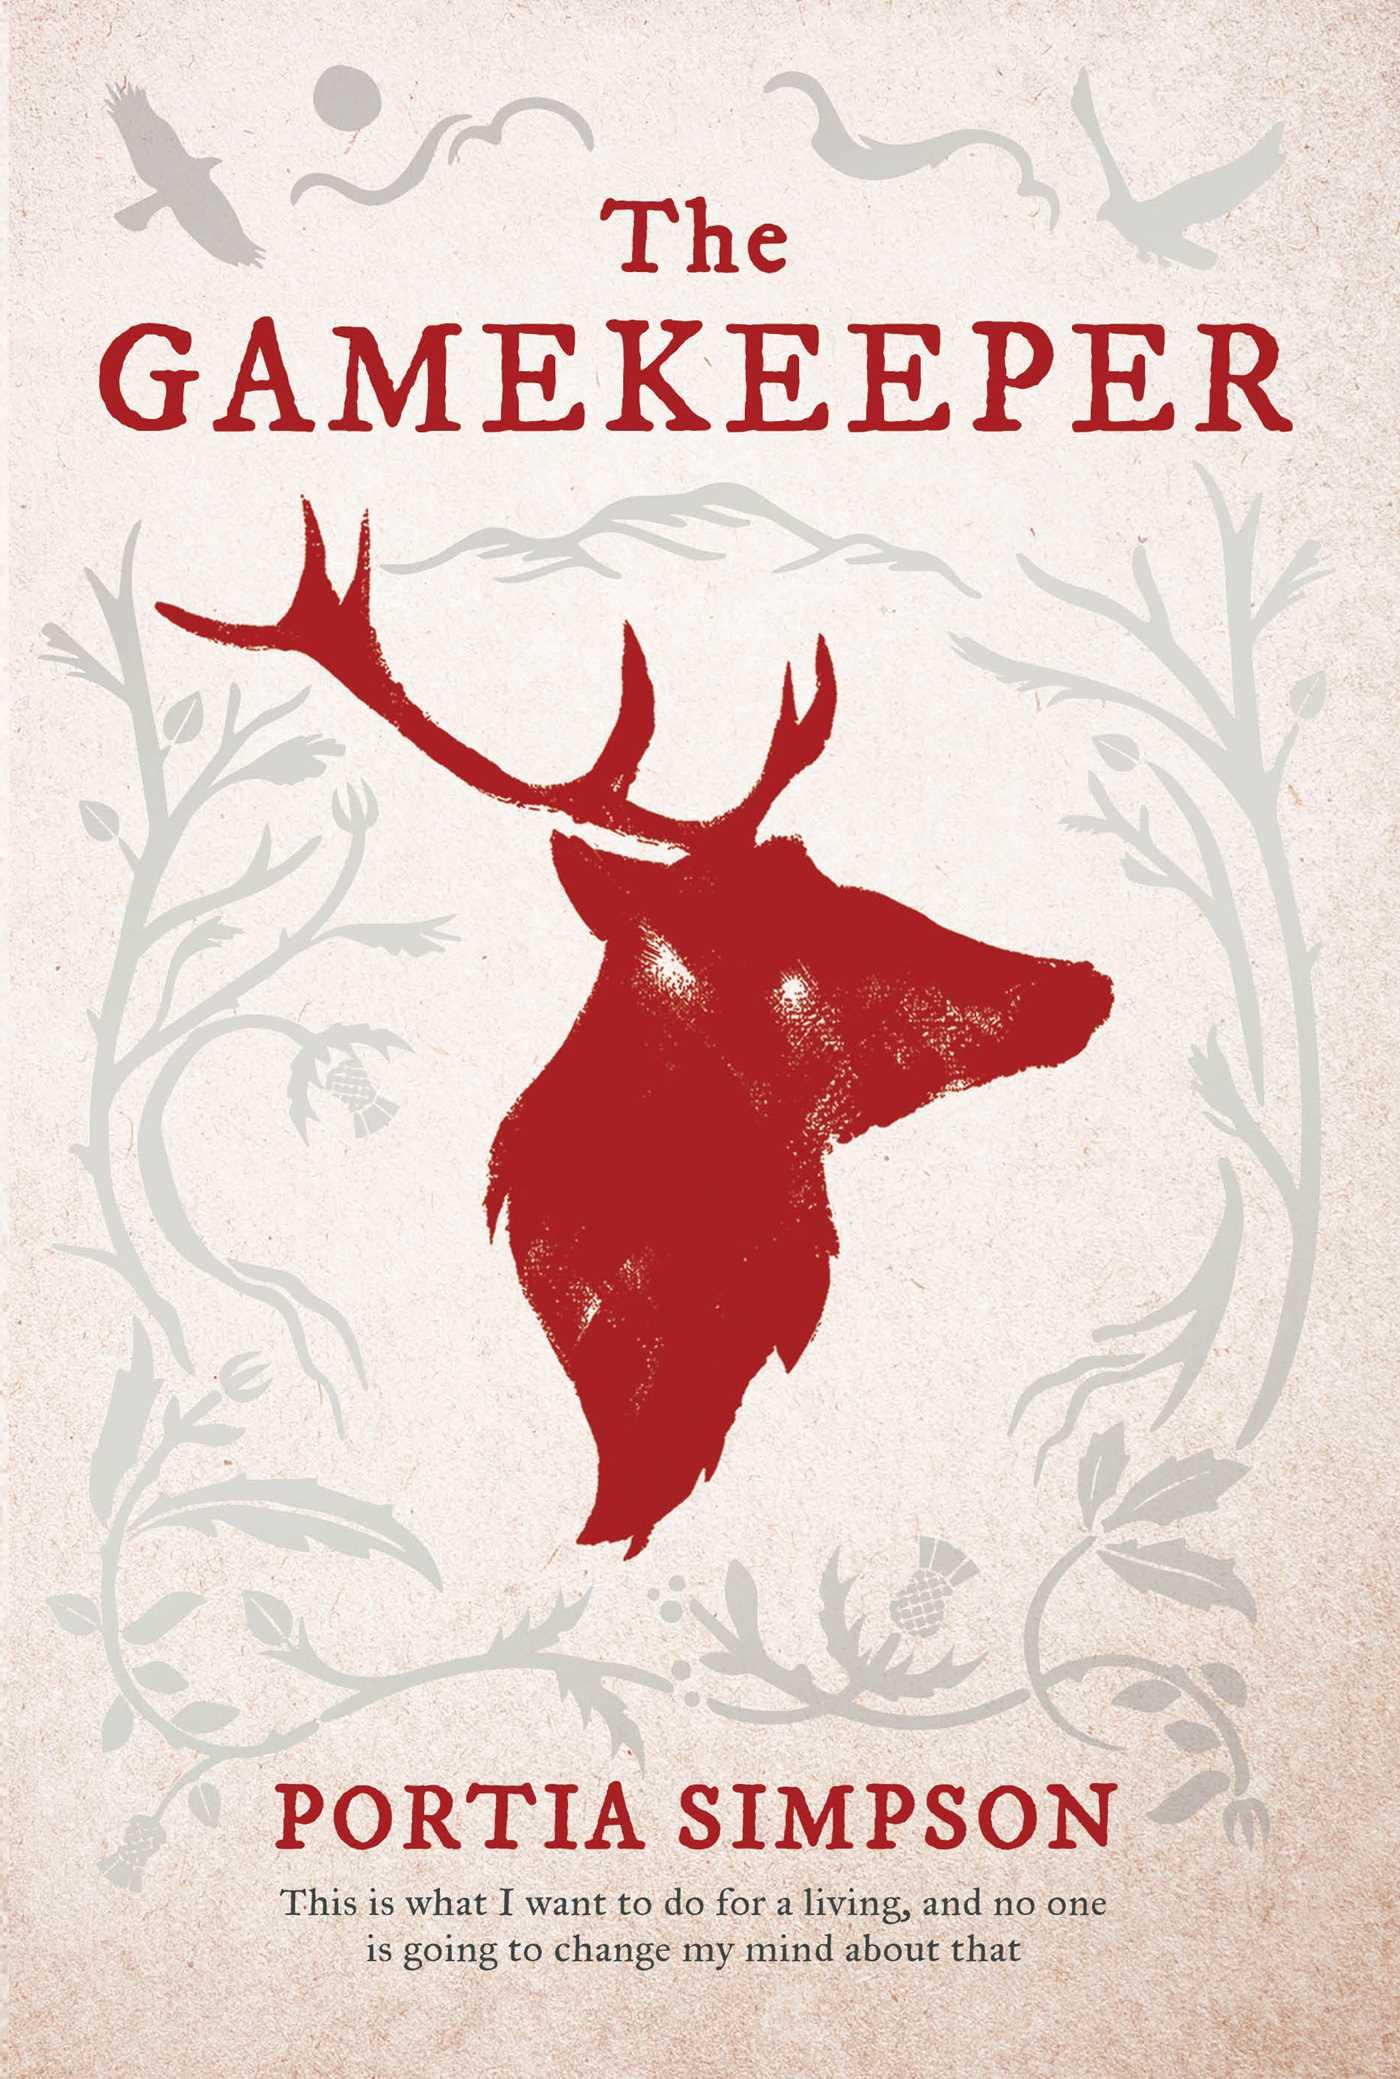 The gamekeeper 9781471159244 hr